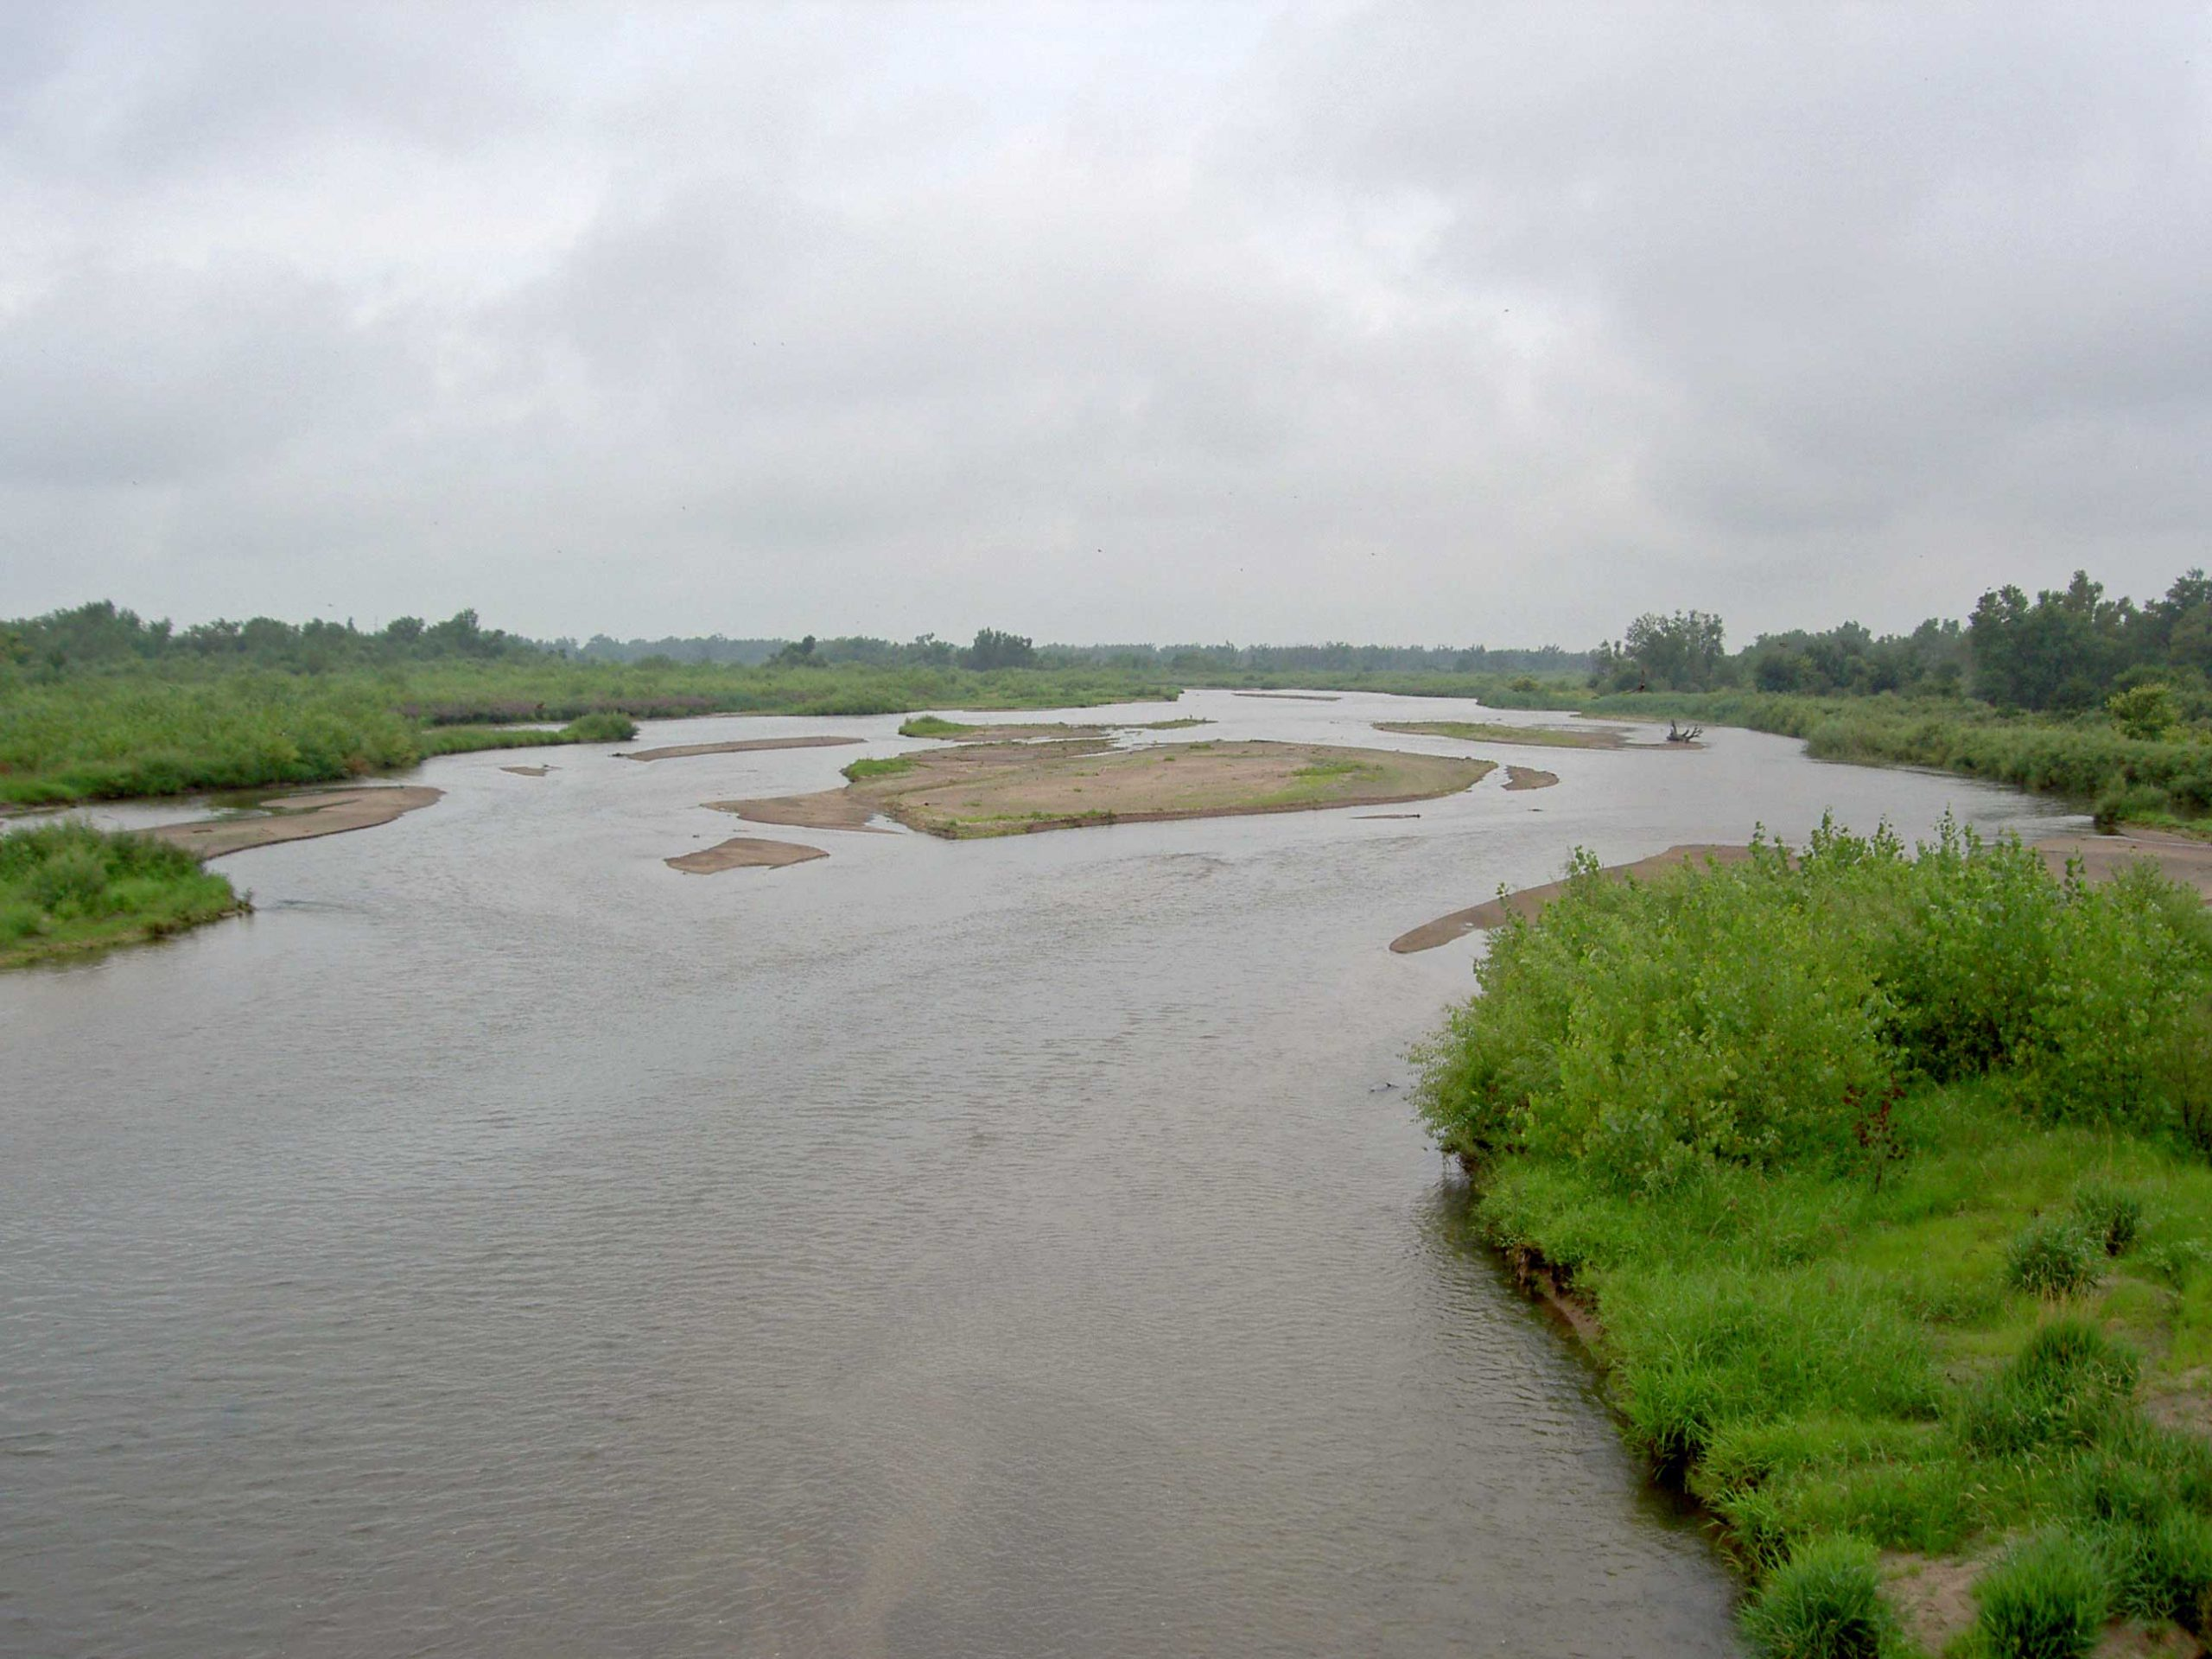 Platte River looking west